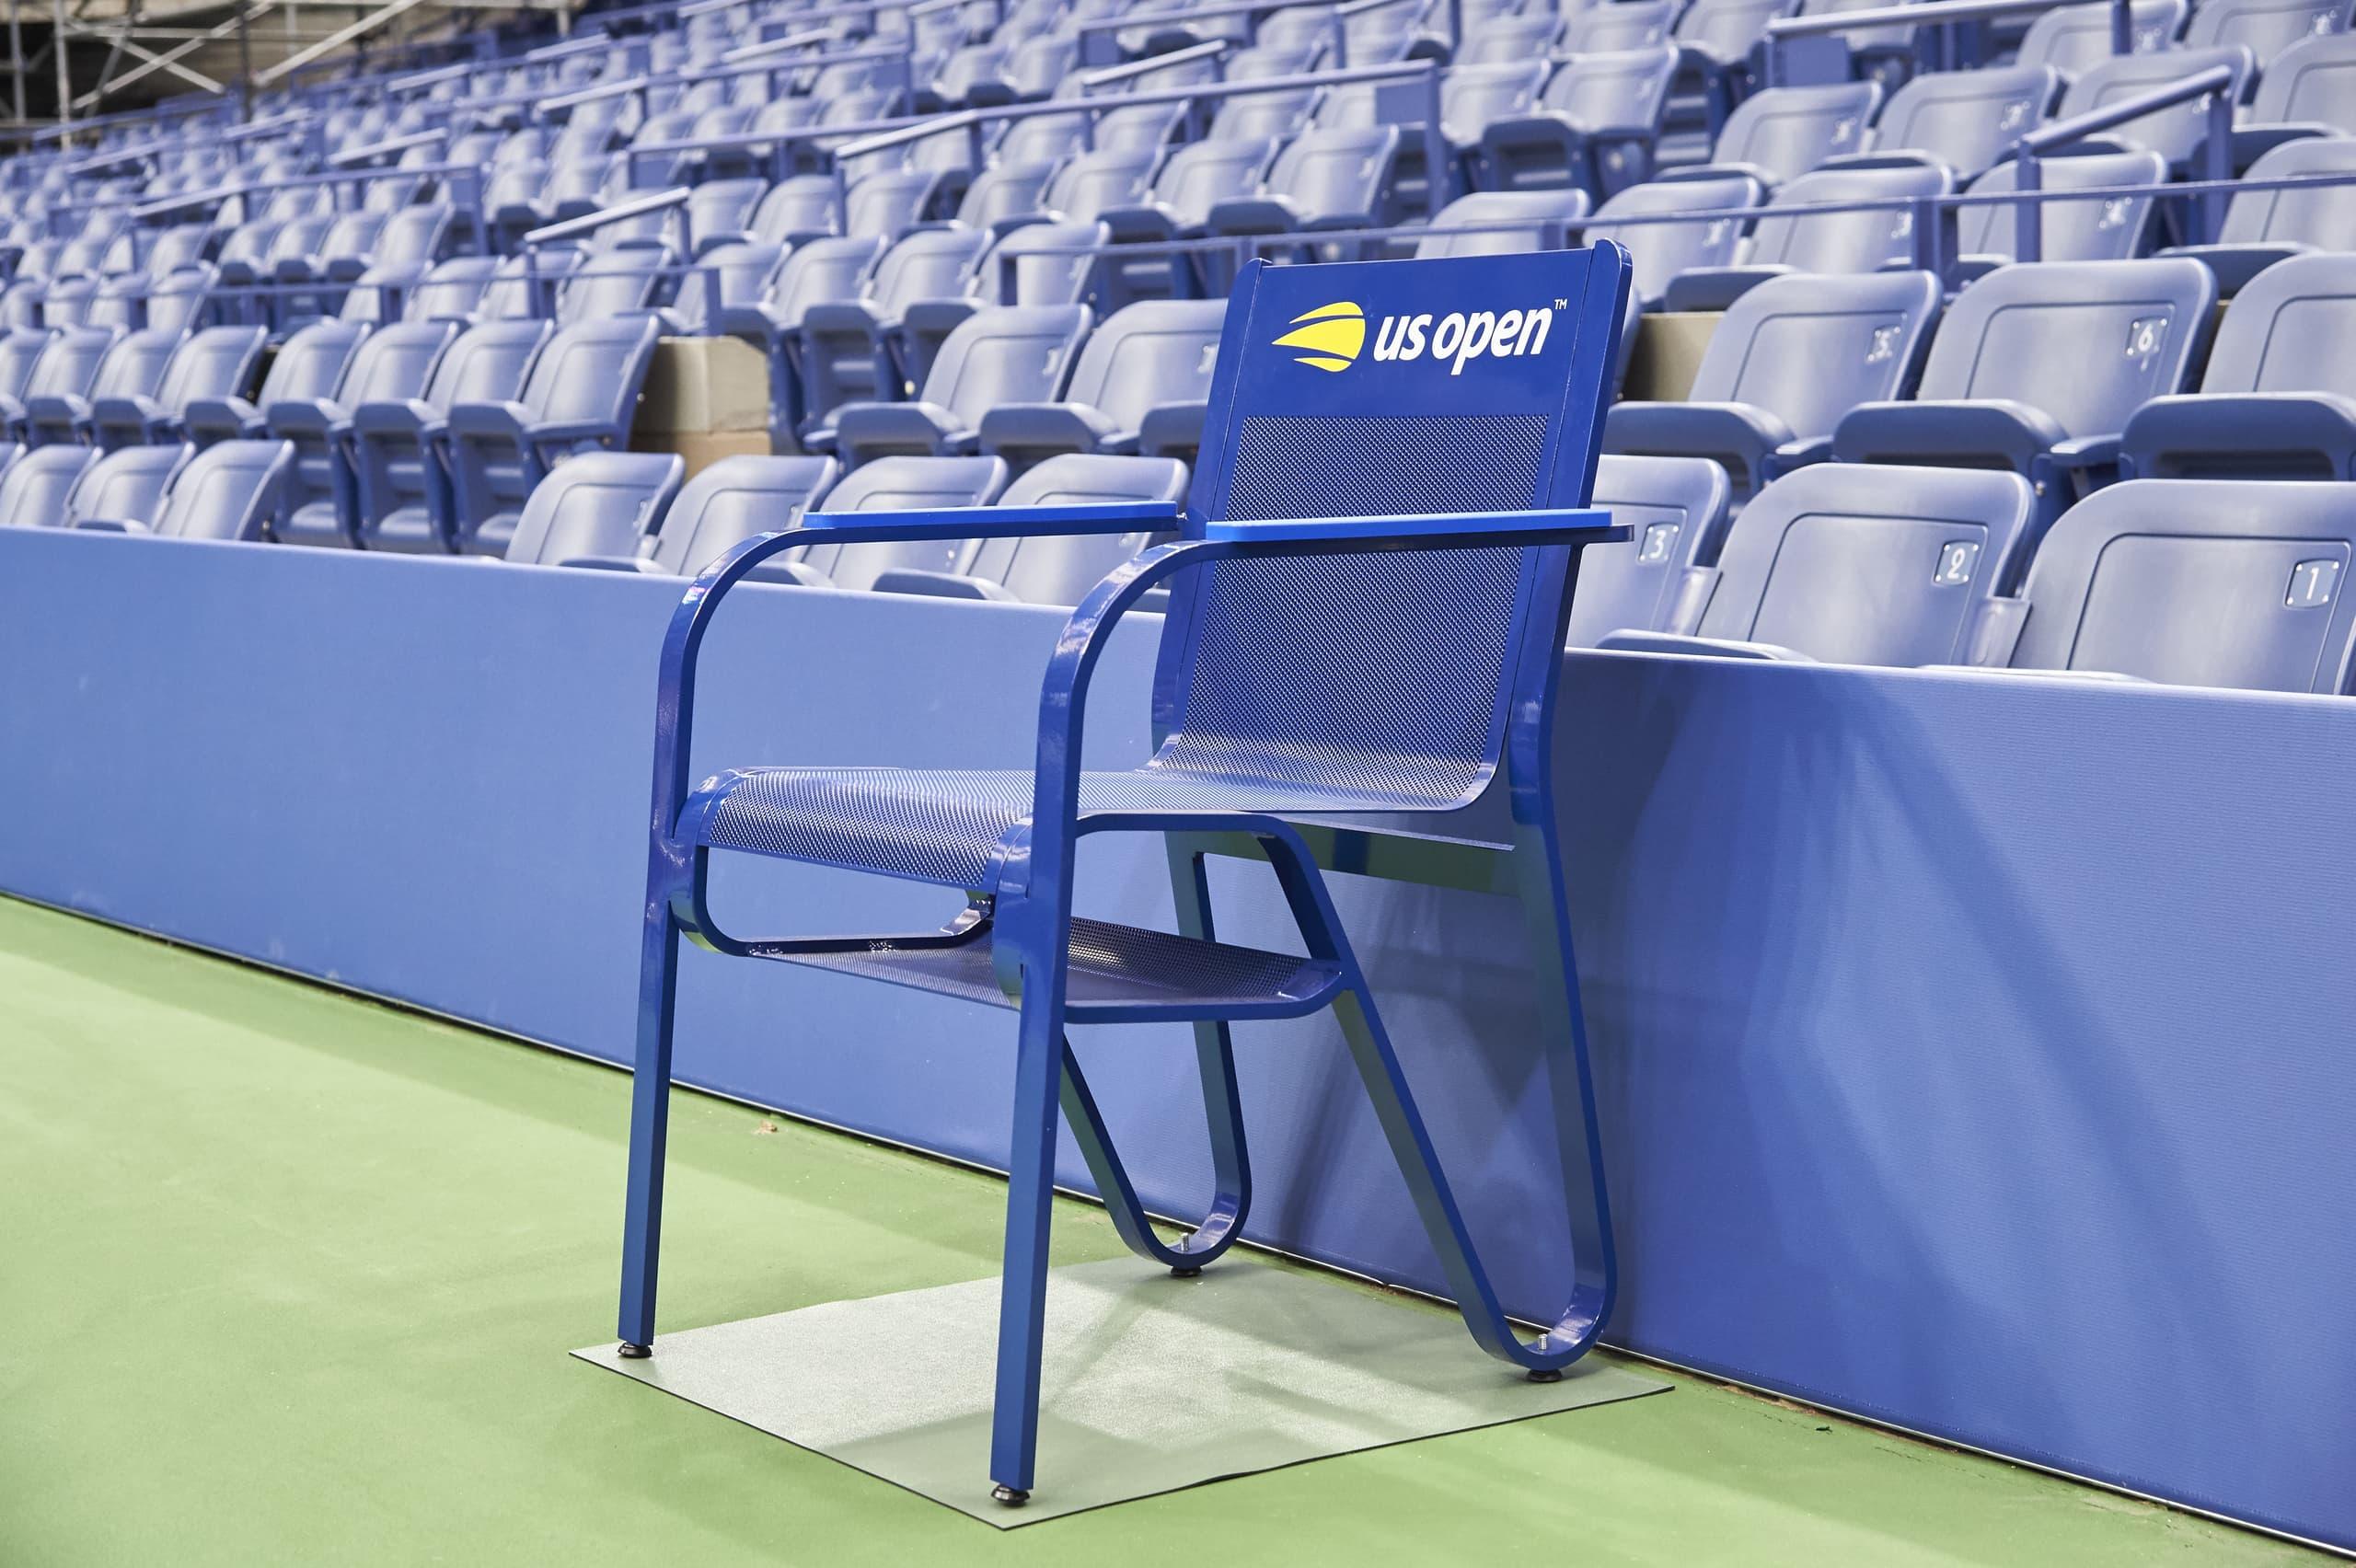 US Open Line Judge Chair